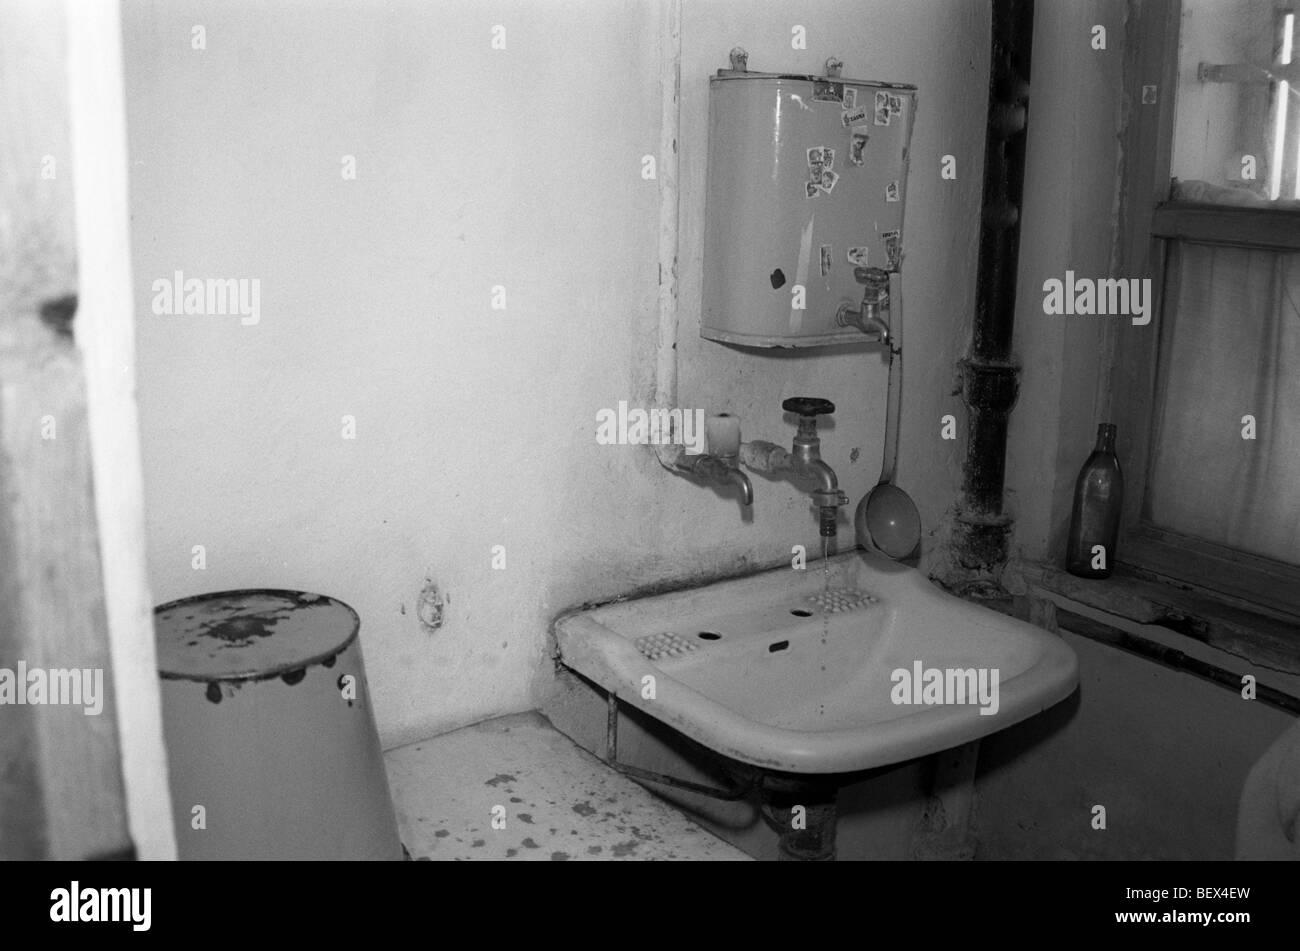 badezimmer in rumänischen waisenhaus, suceava, moldawien, 1990, Badezimmer ideen